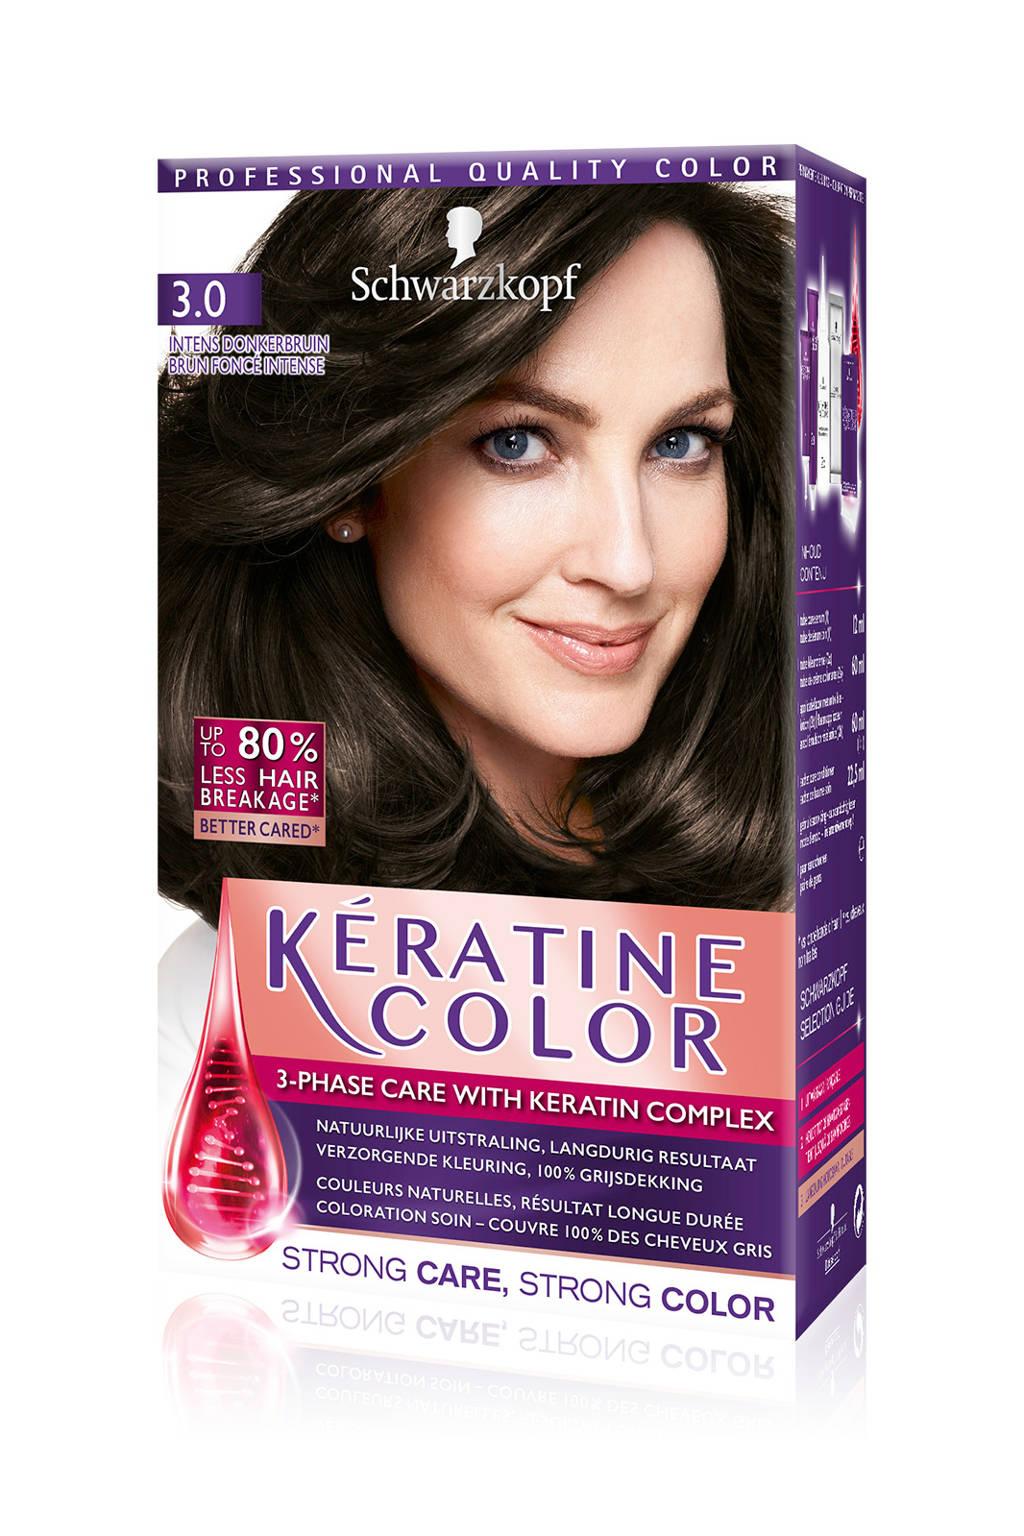 Schwarzkopf Keratine Color haarkleuring - 3.0 Intense Donkerbruin, 3.0 intens dbrn